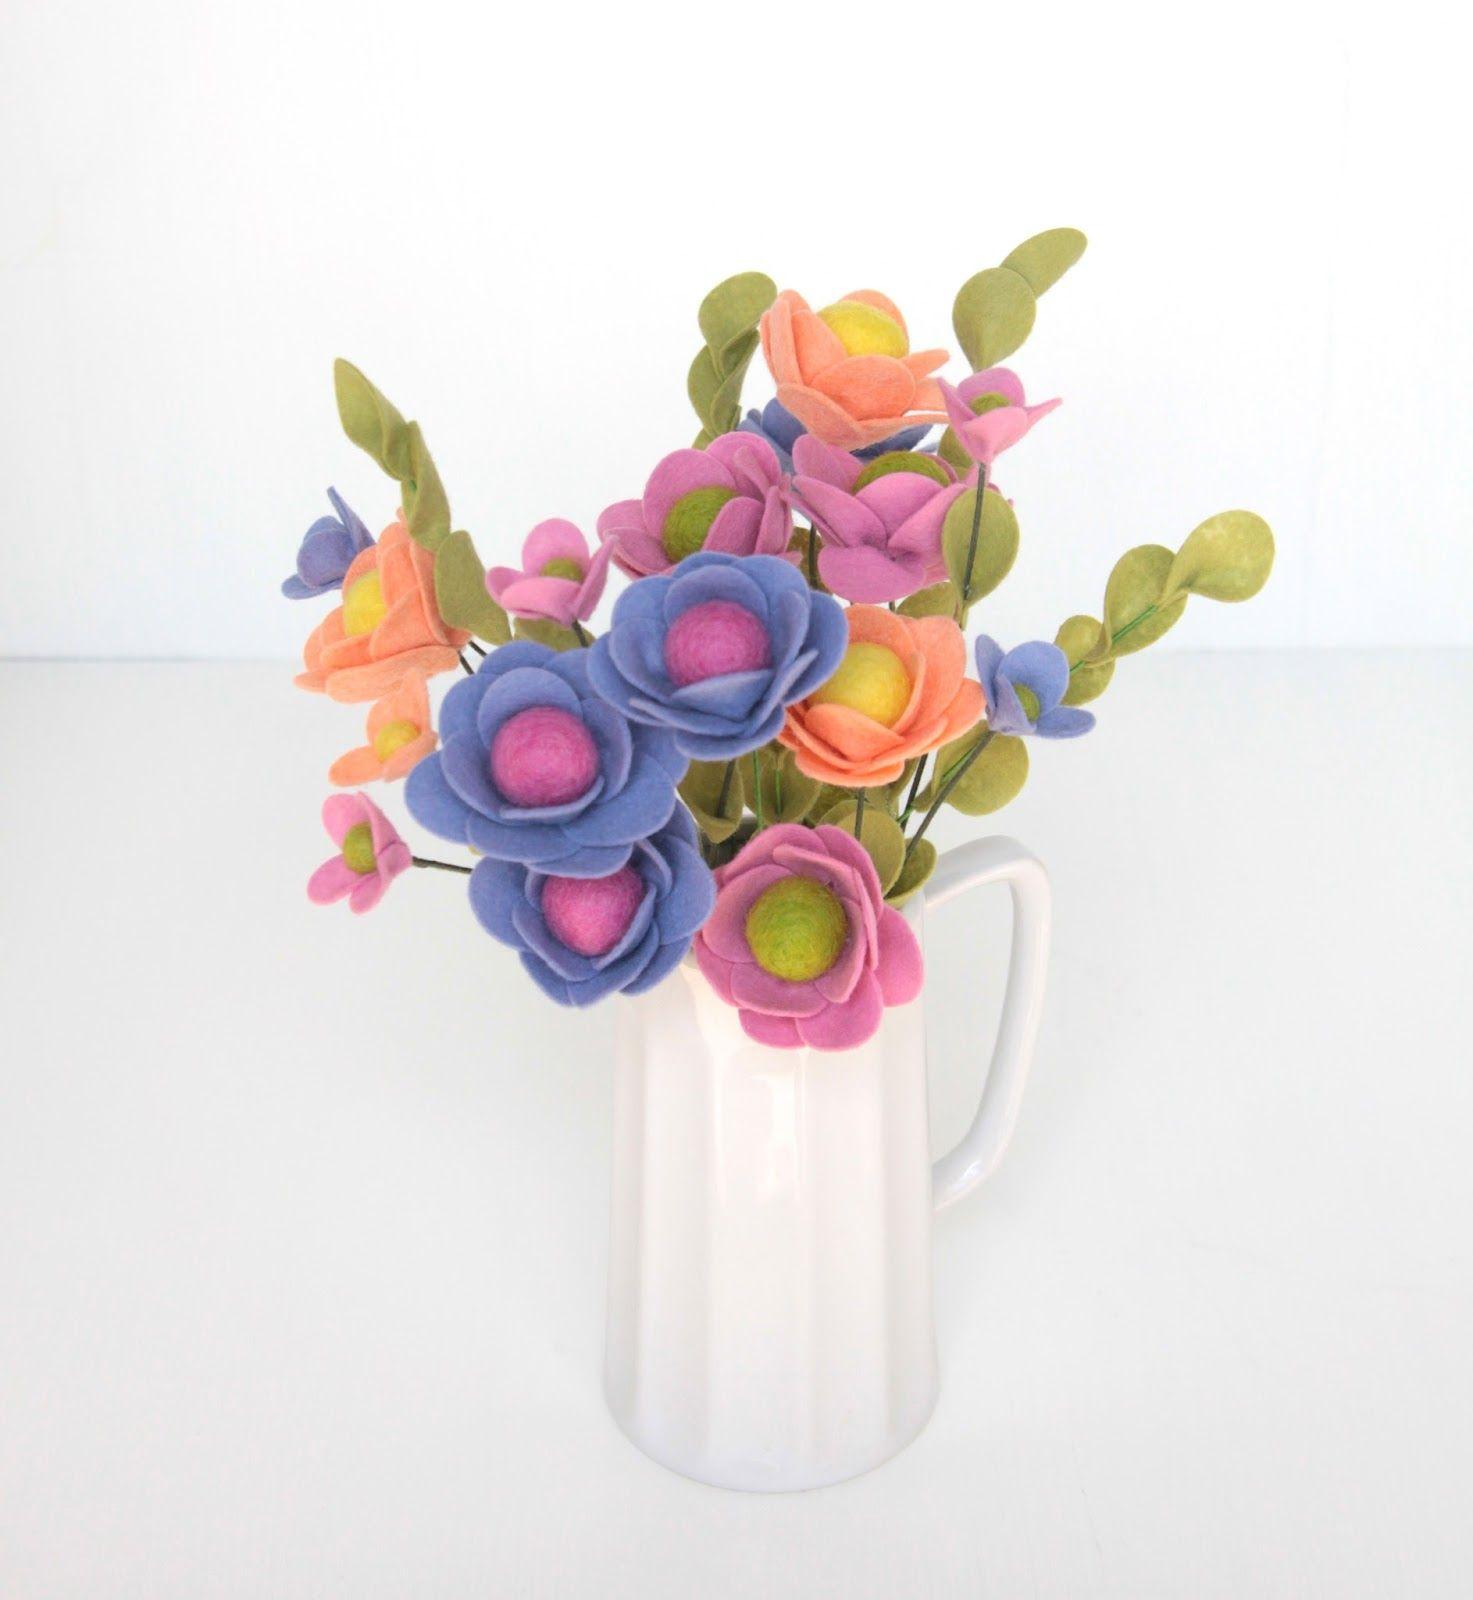 Diy Felt Flower Bouquet Make One For Mom Crafty Stacis Friday